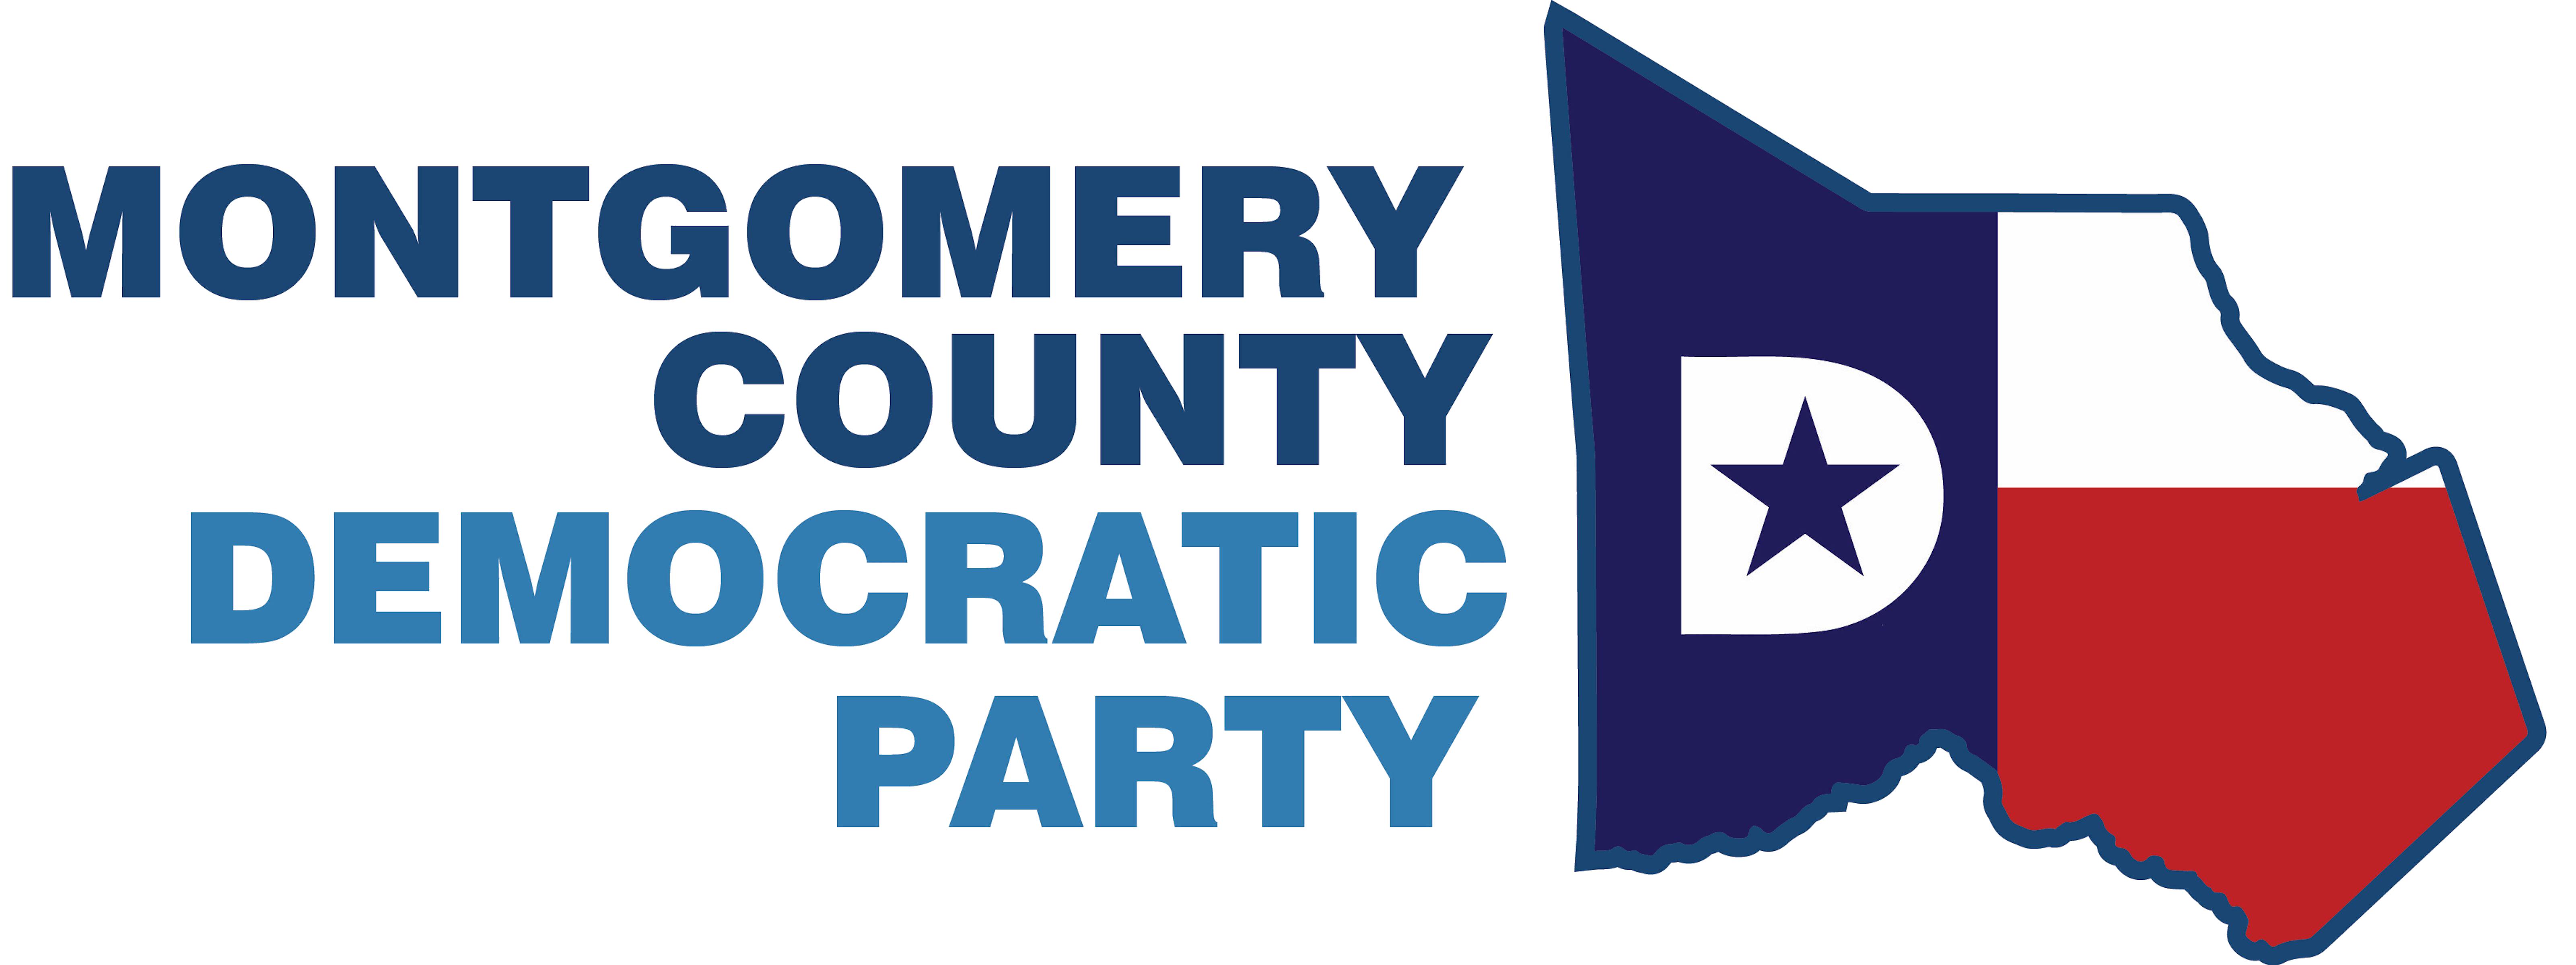 Montgomery County Democratic Party